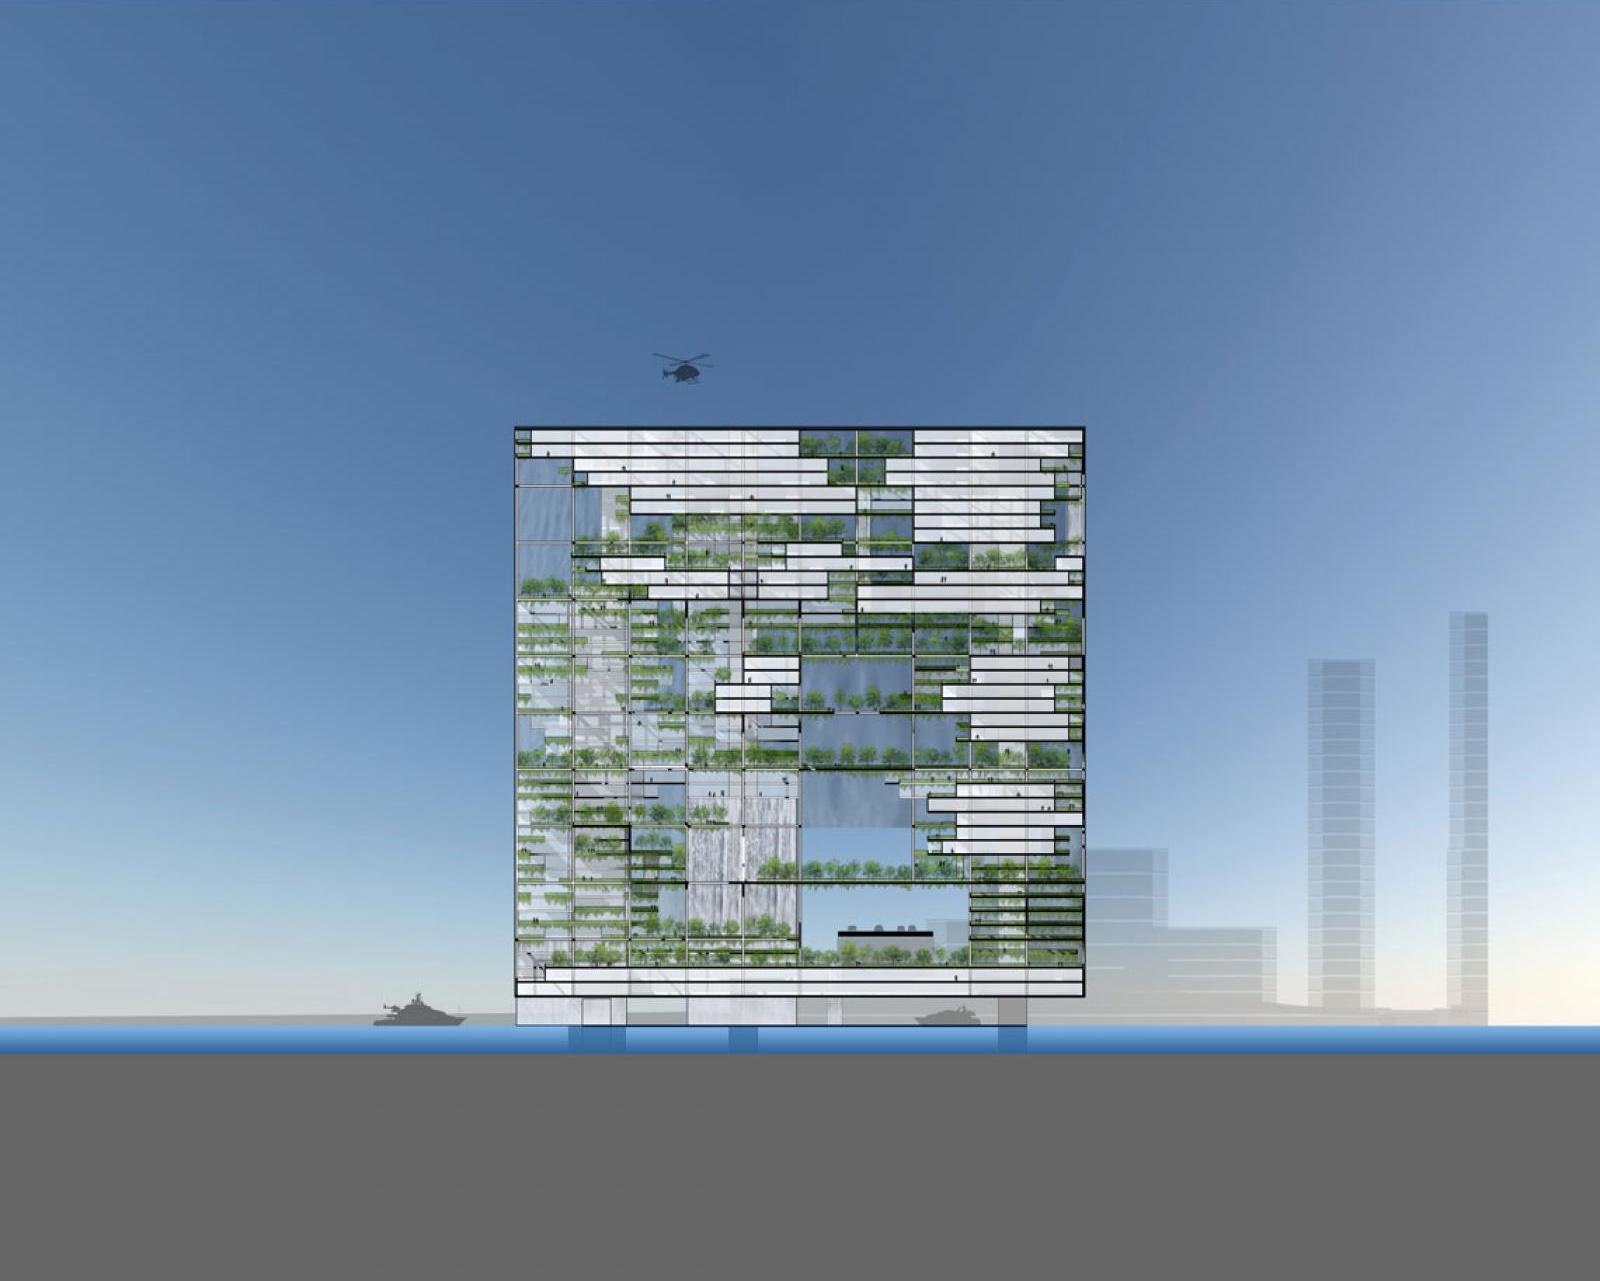 Matrix gateway complex by adrian smith gordon gill for Home gateway architecture